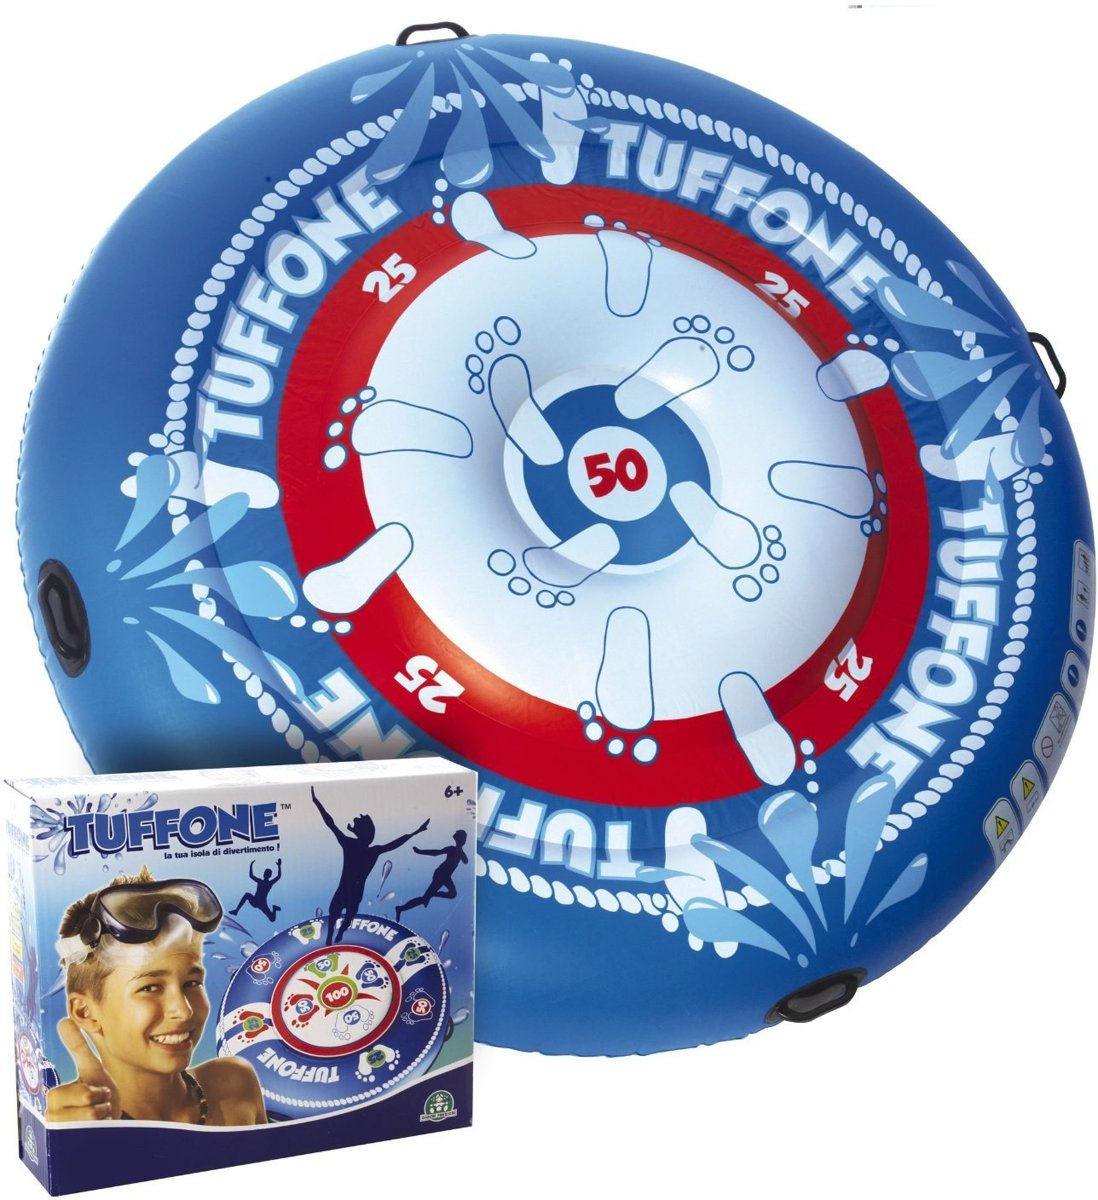 Tuffone - Water Trampoline Band - 150x22cm